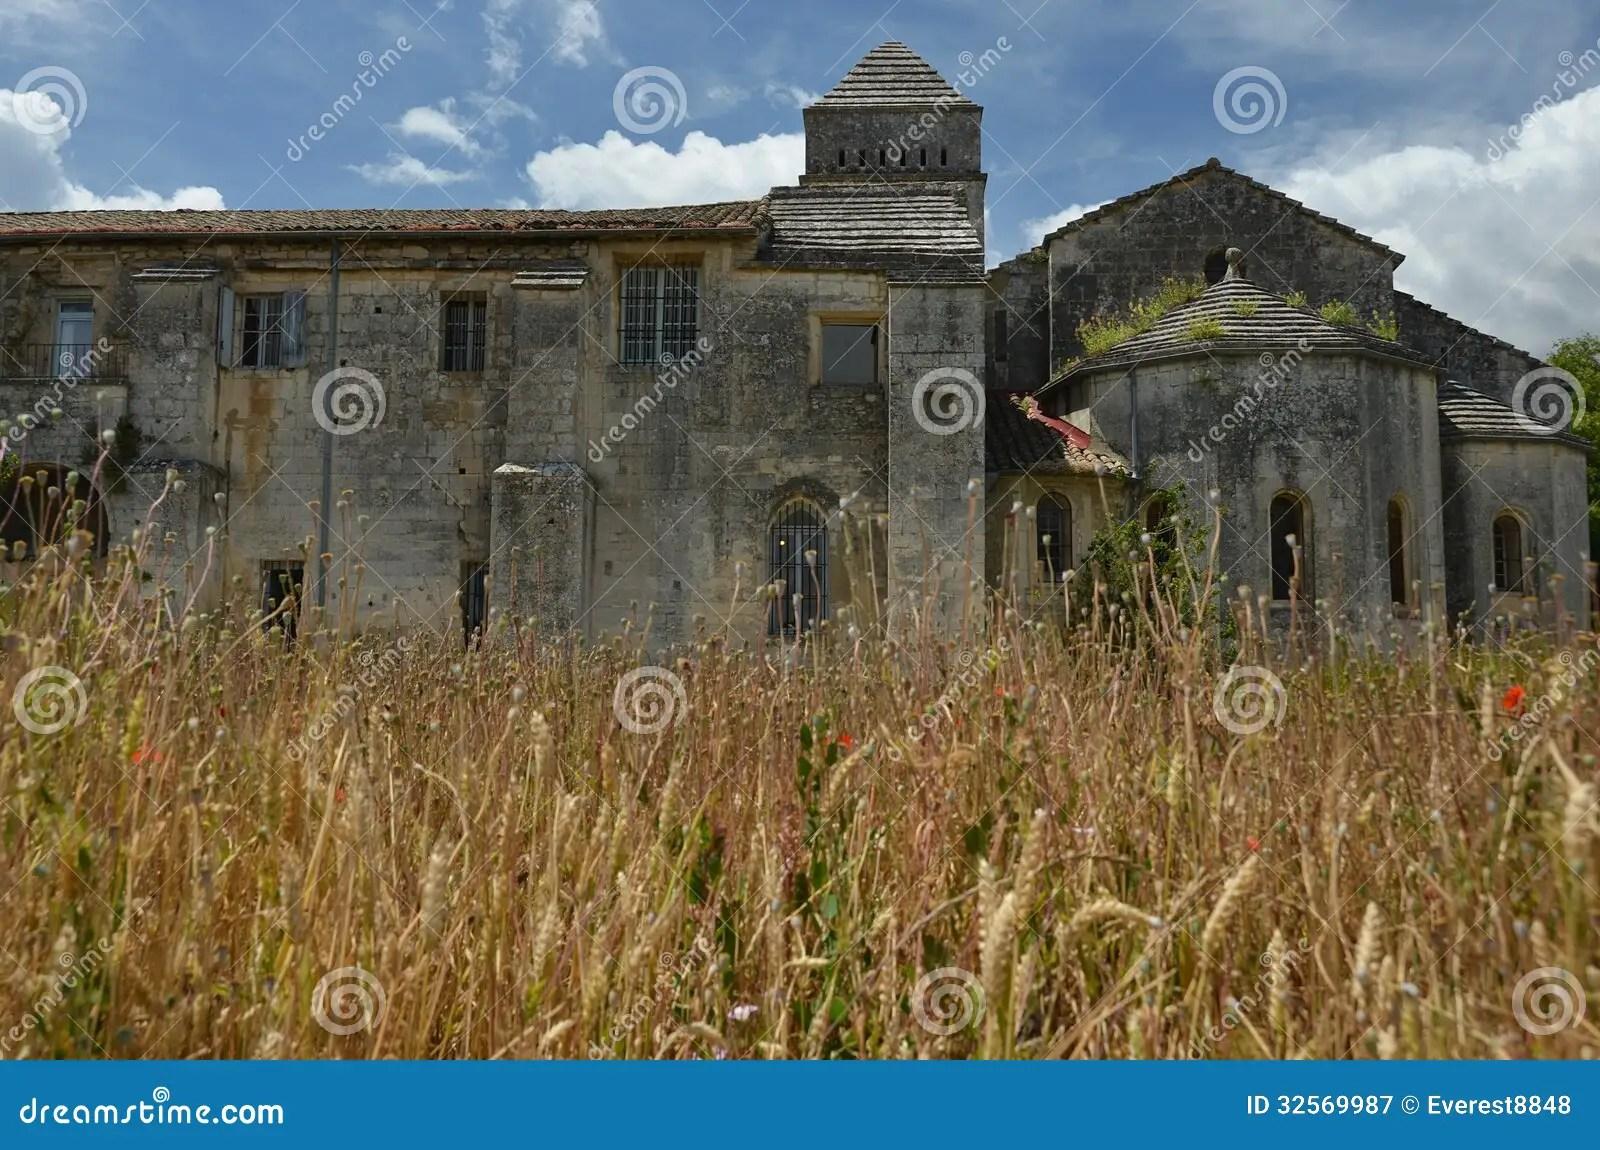 Vincent Van Goghs Asylum In Saint Remy France Royalty